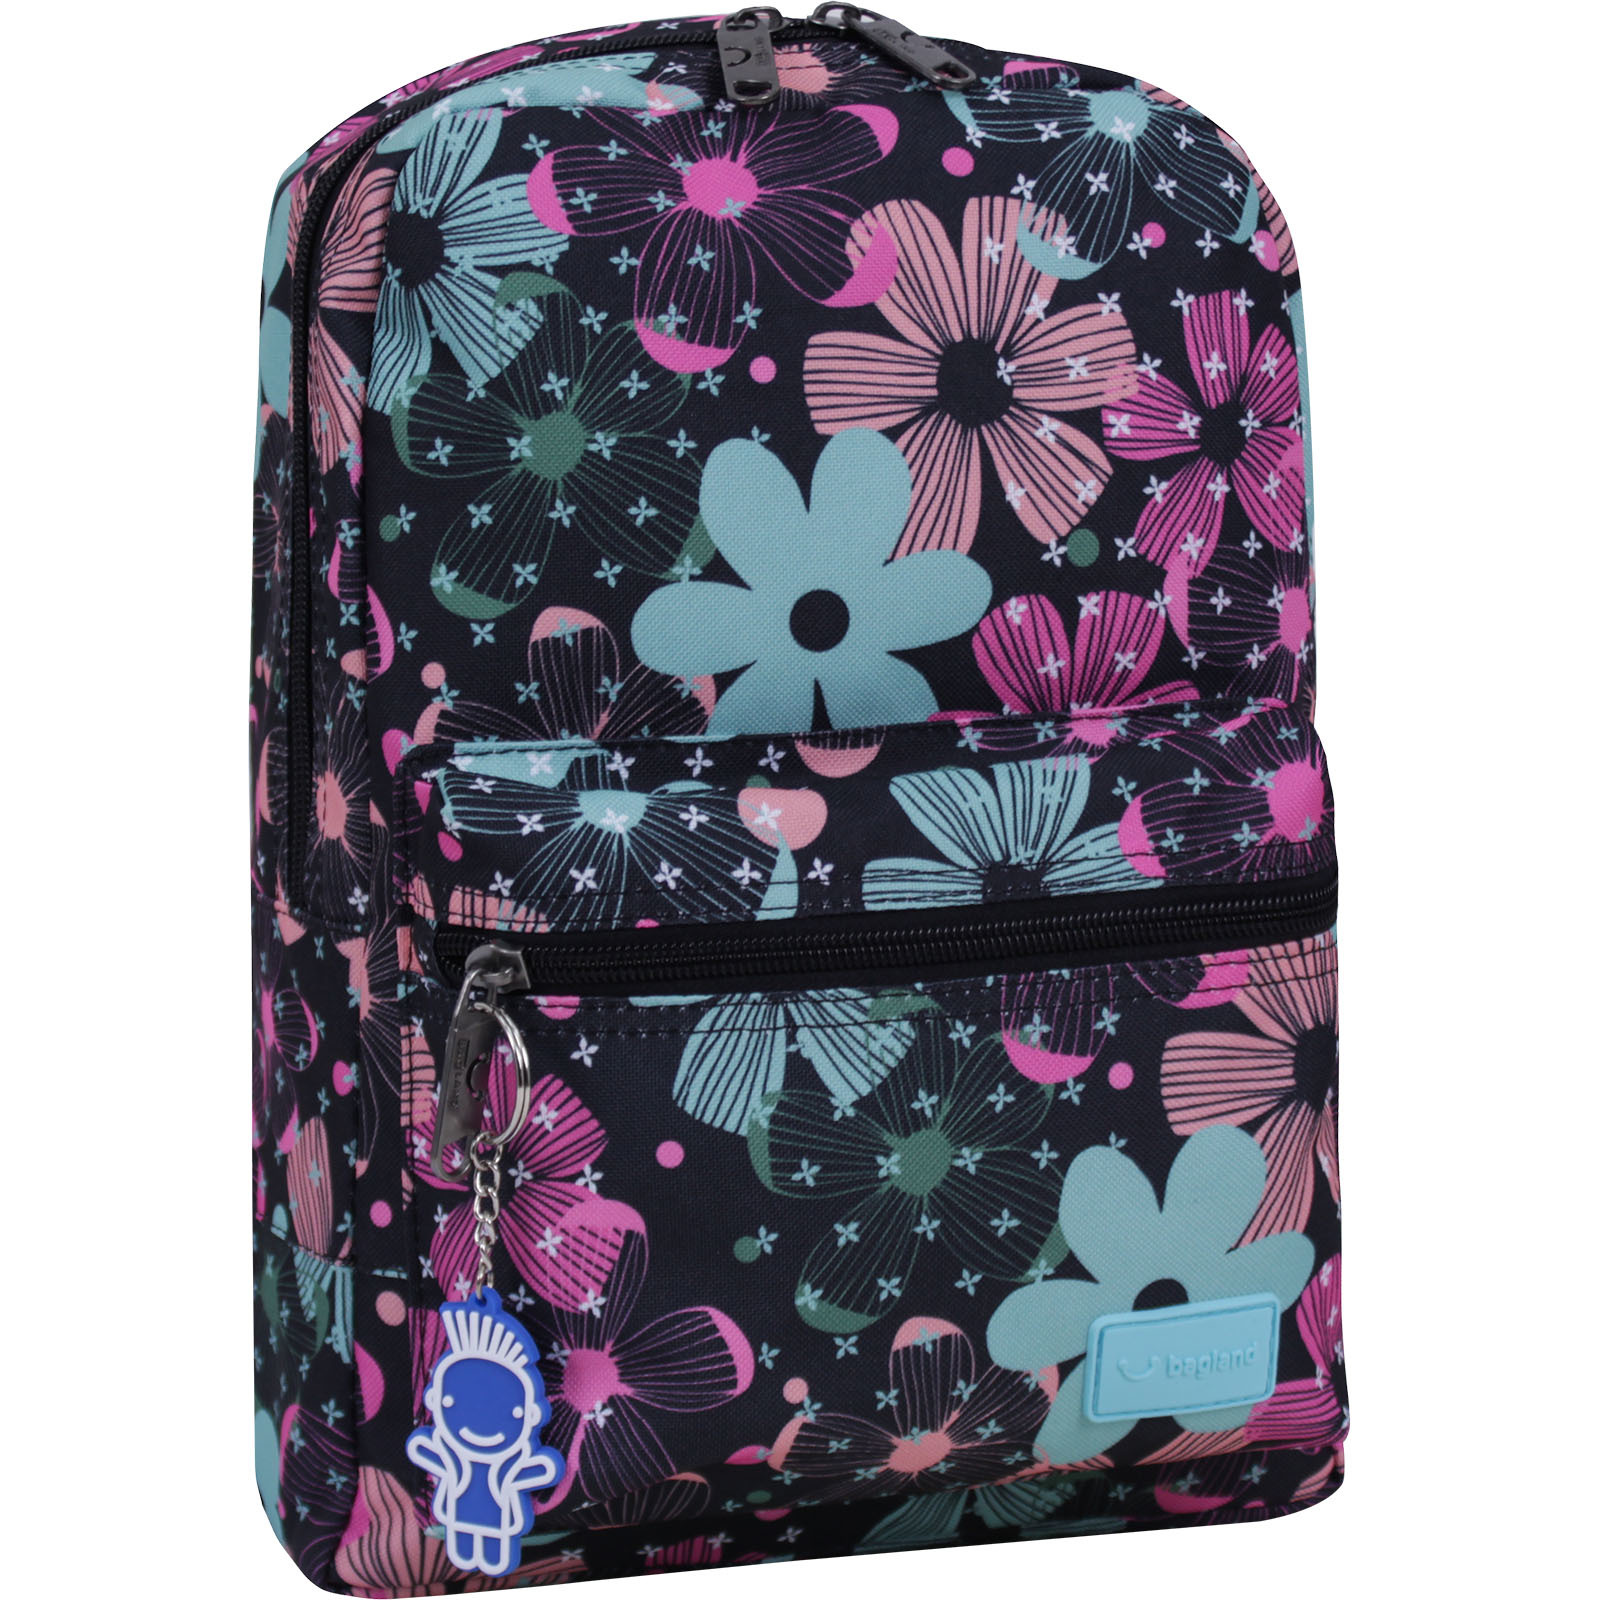 Детские рюкзаки Рюкзак Bagland Молодежный mini 8 л. сублімація 385 (00508664) IMG_8203суб385-1600.jpg